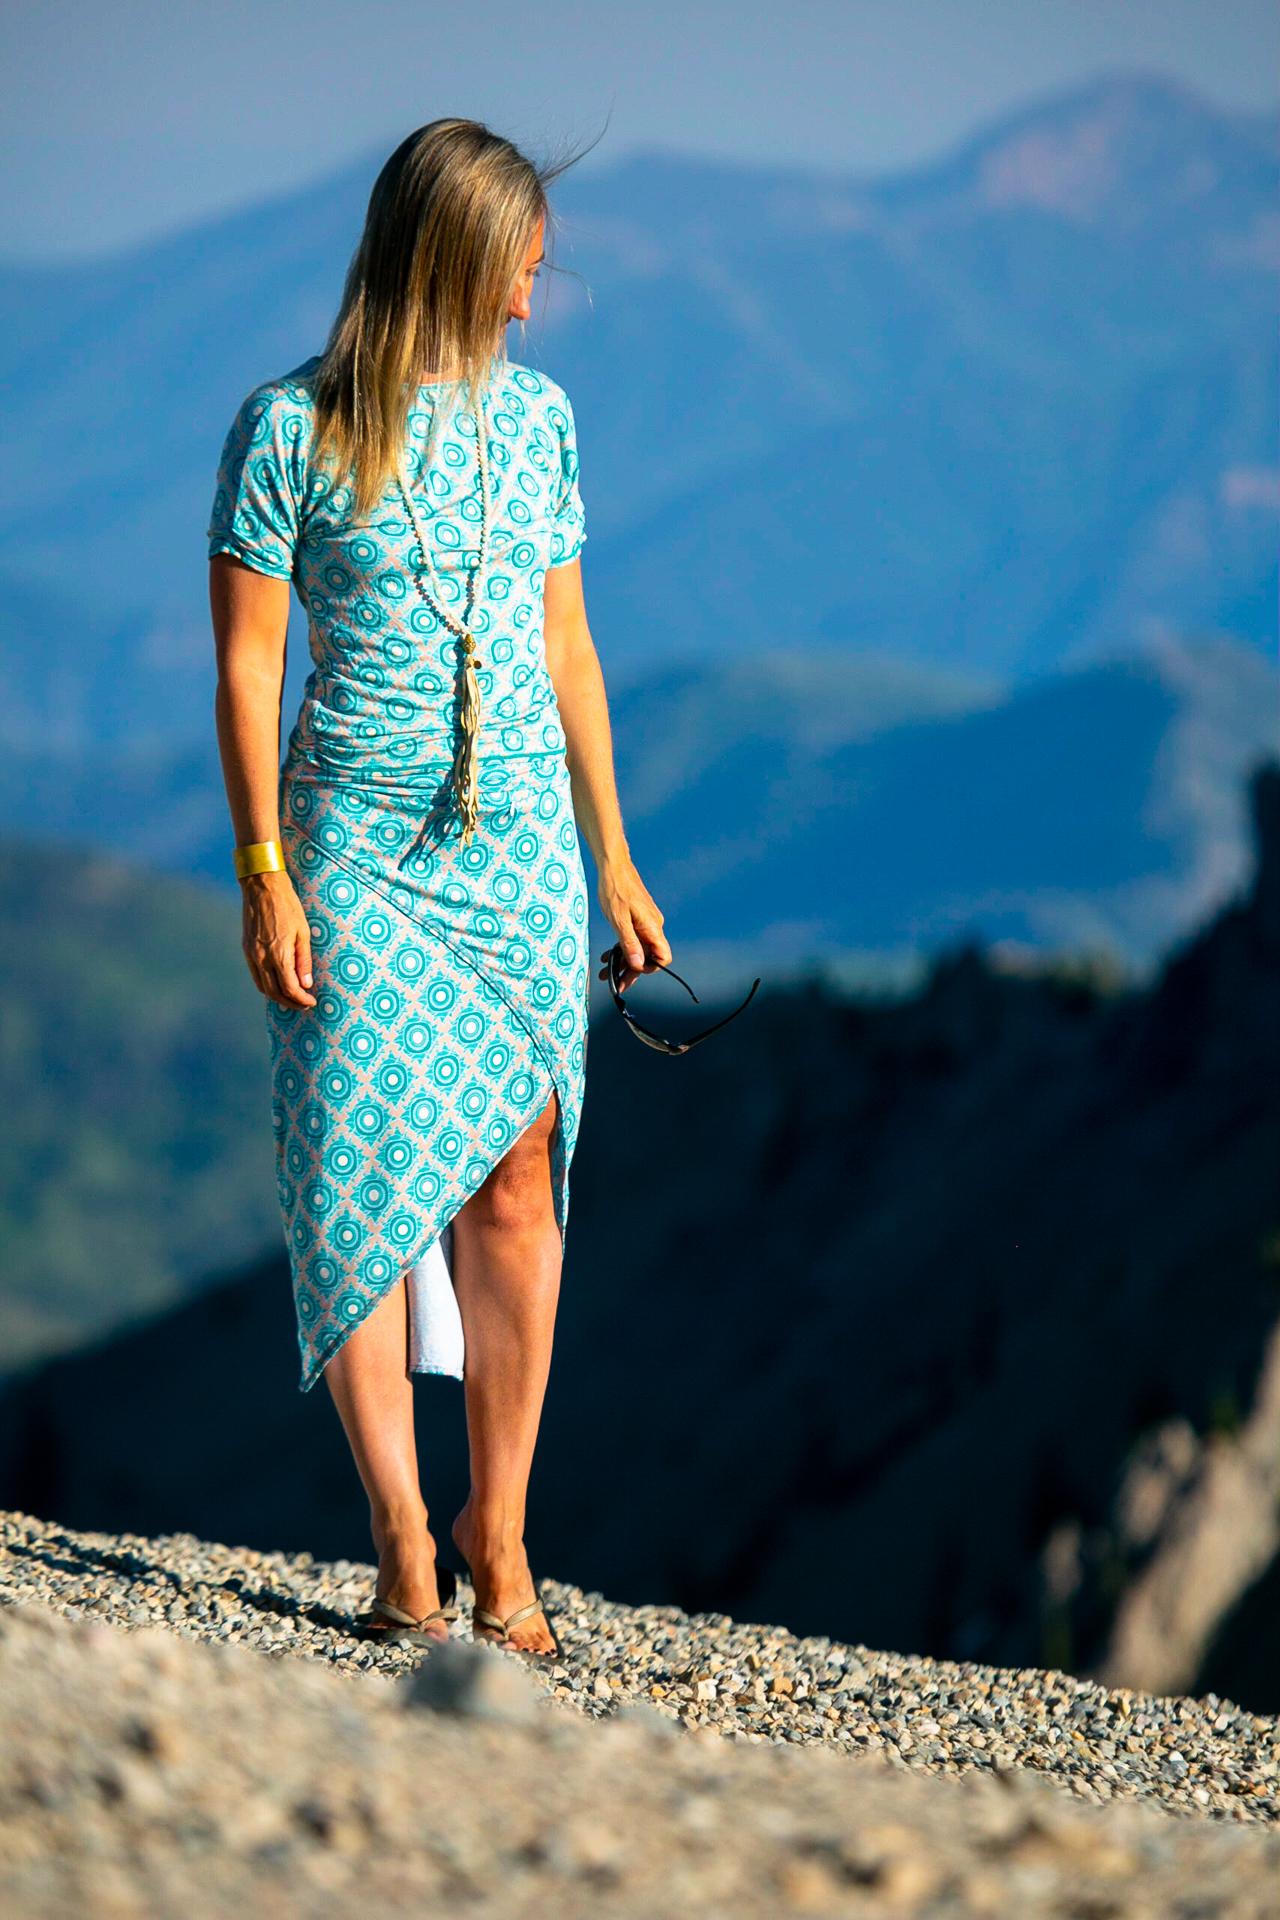 Solitude Skirt in Teal Daisy